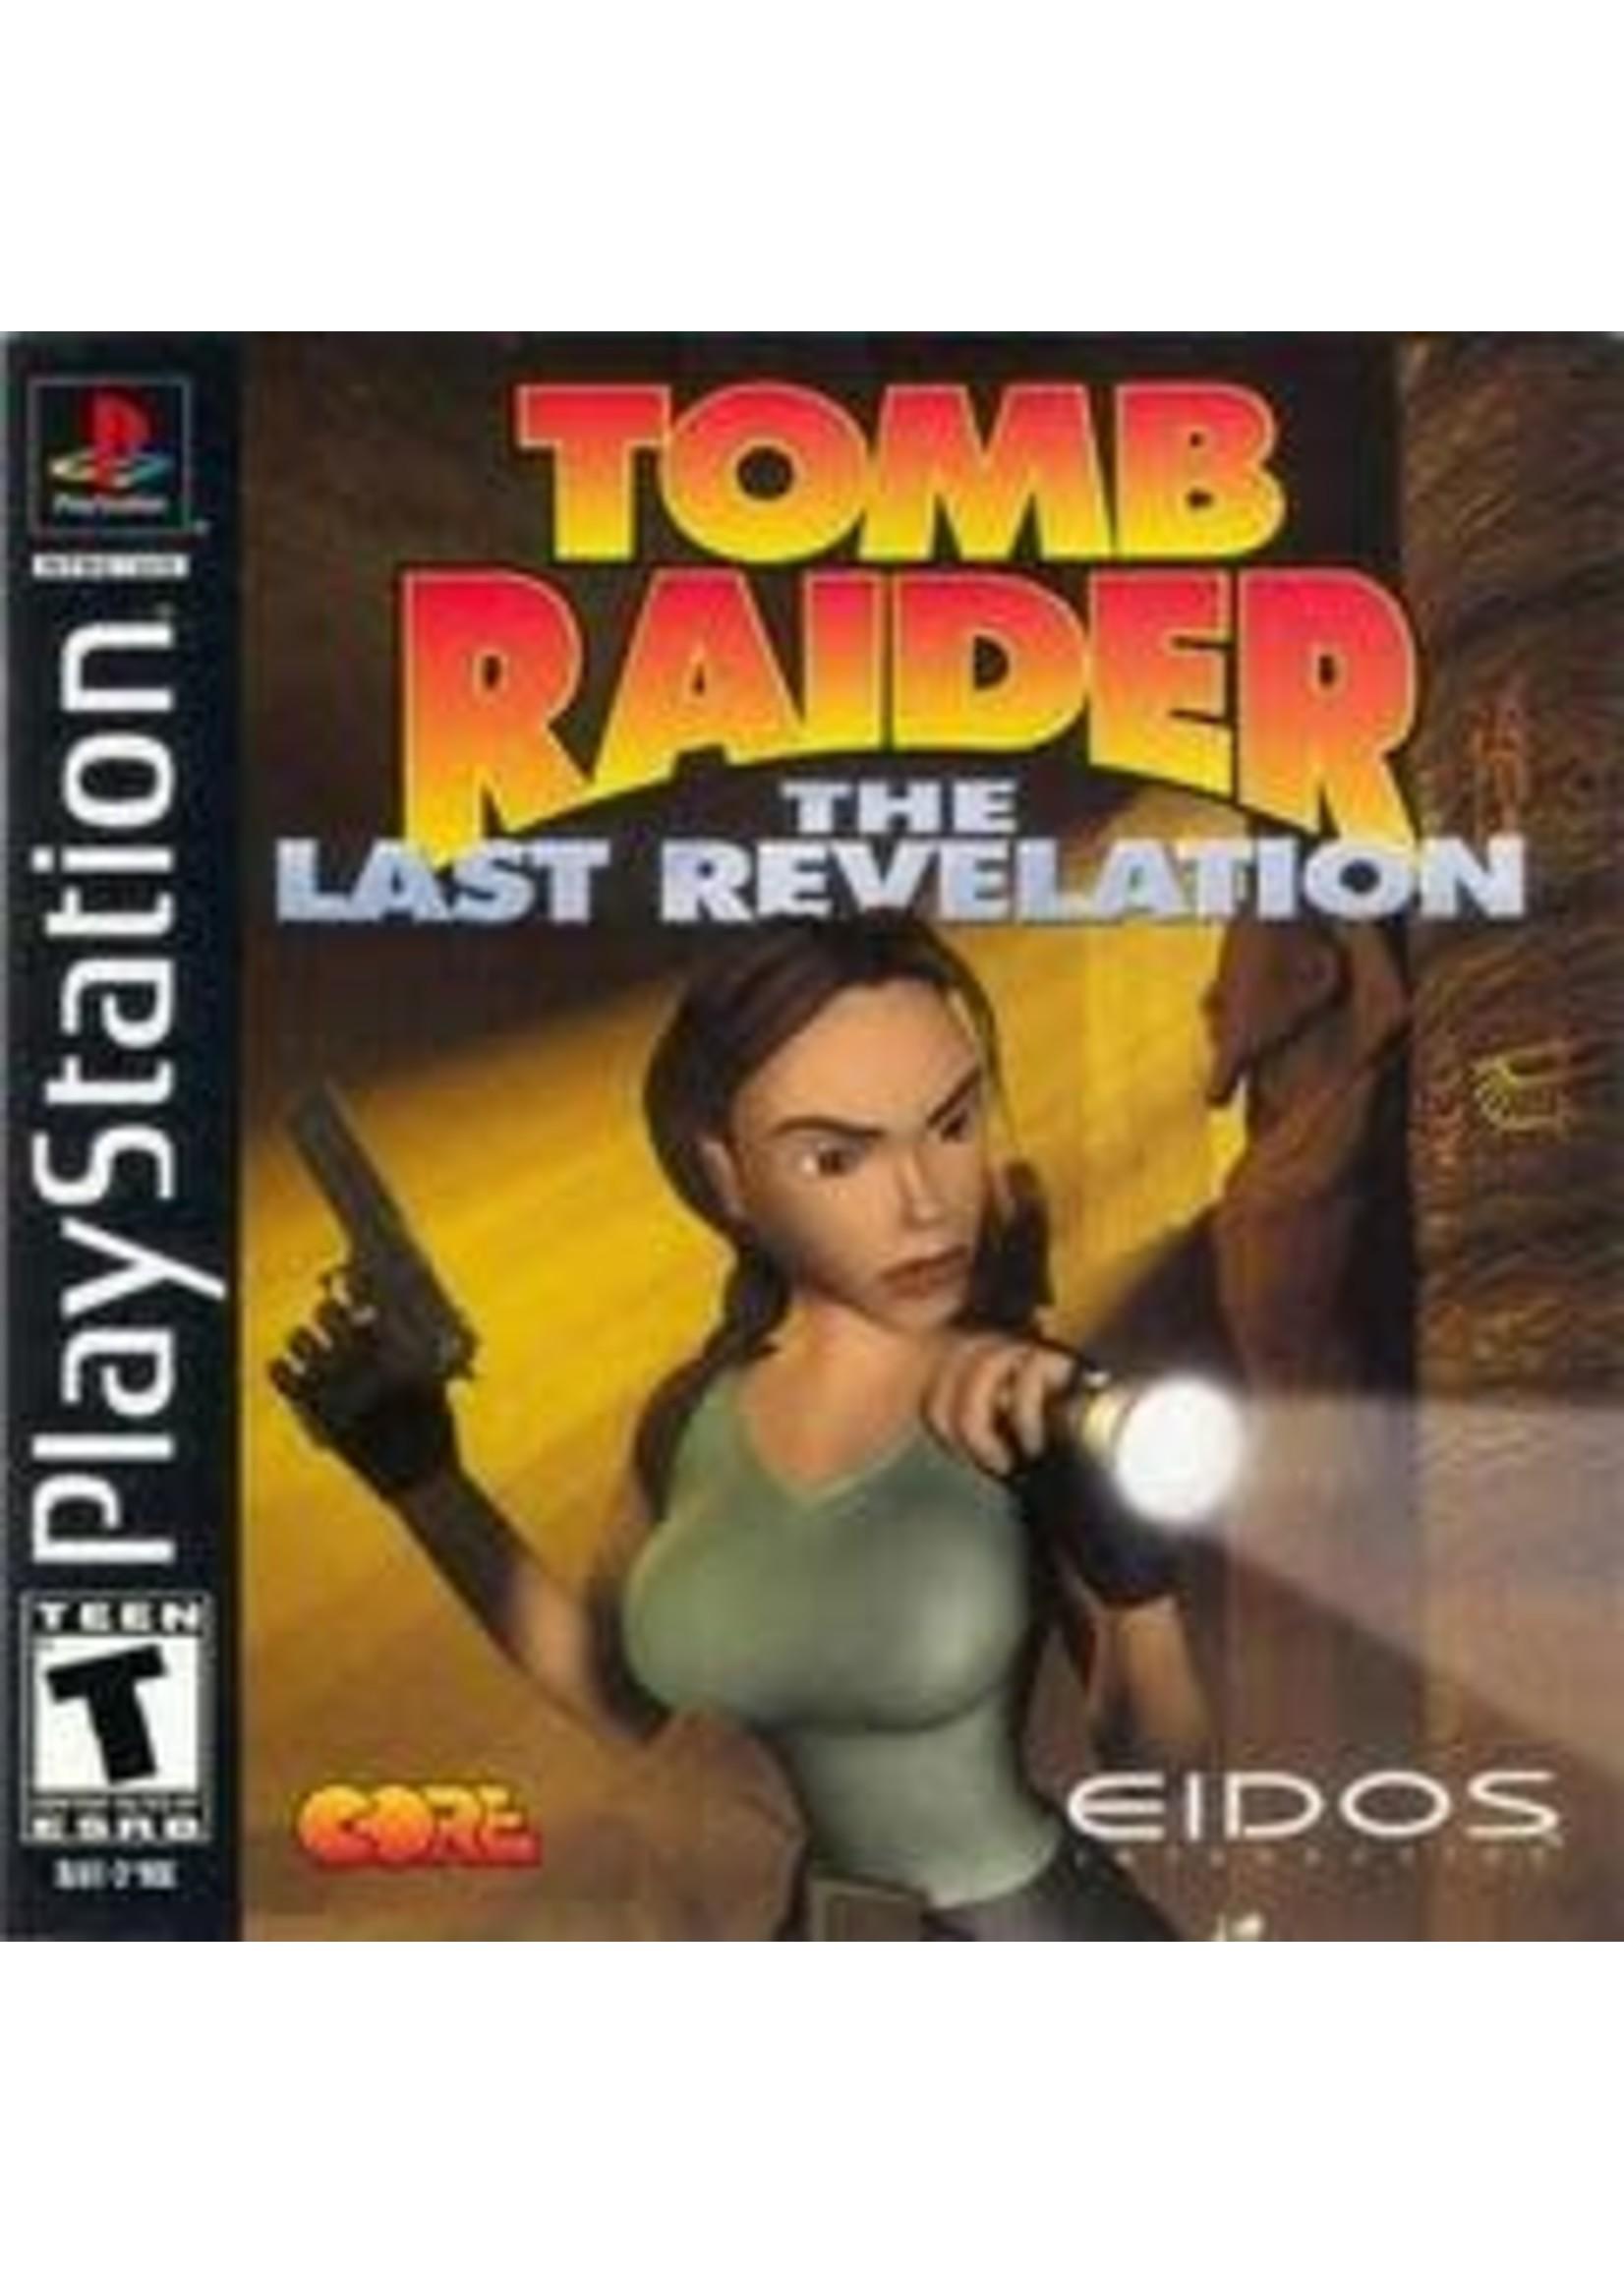 Tomb Raider Last Revelation Playstation